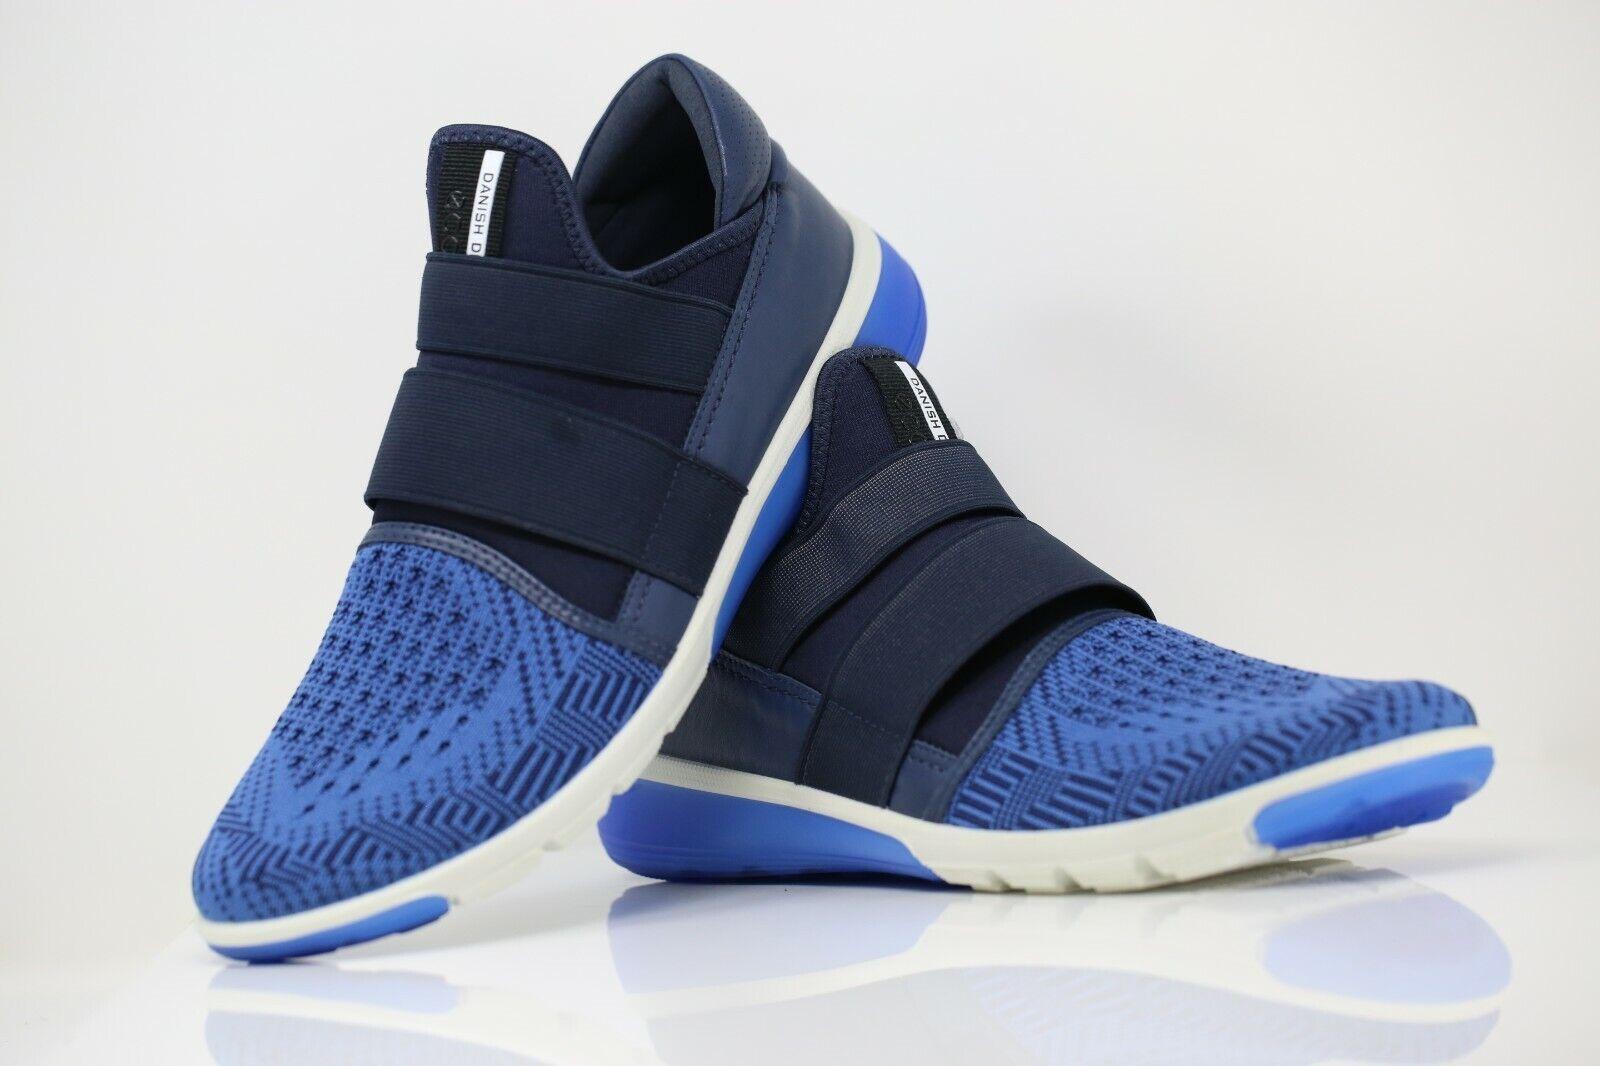 Ecco intrinsèque 2 Femmes Unisexe Chaussures Baskets Noir Bleu UK 8 EUR 41